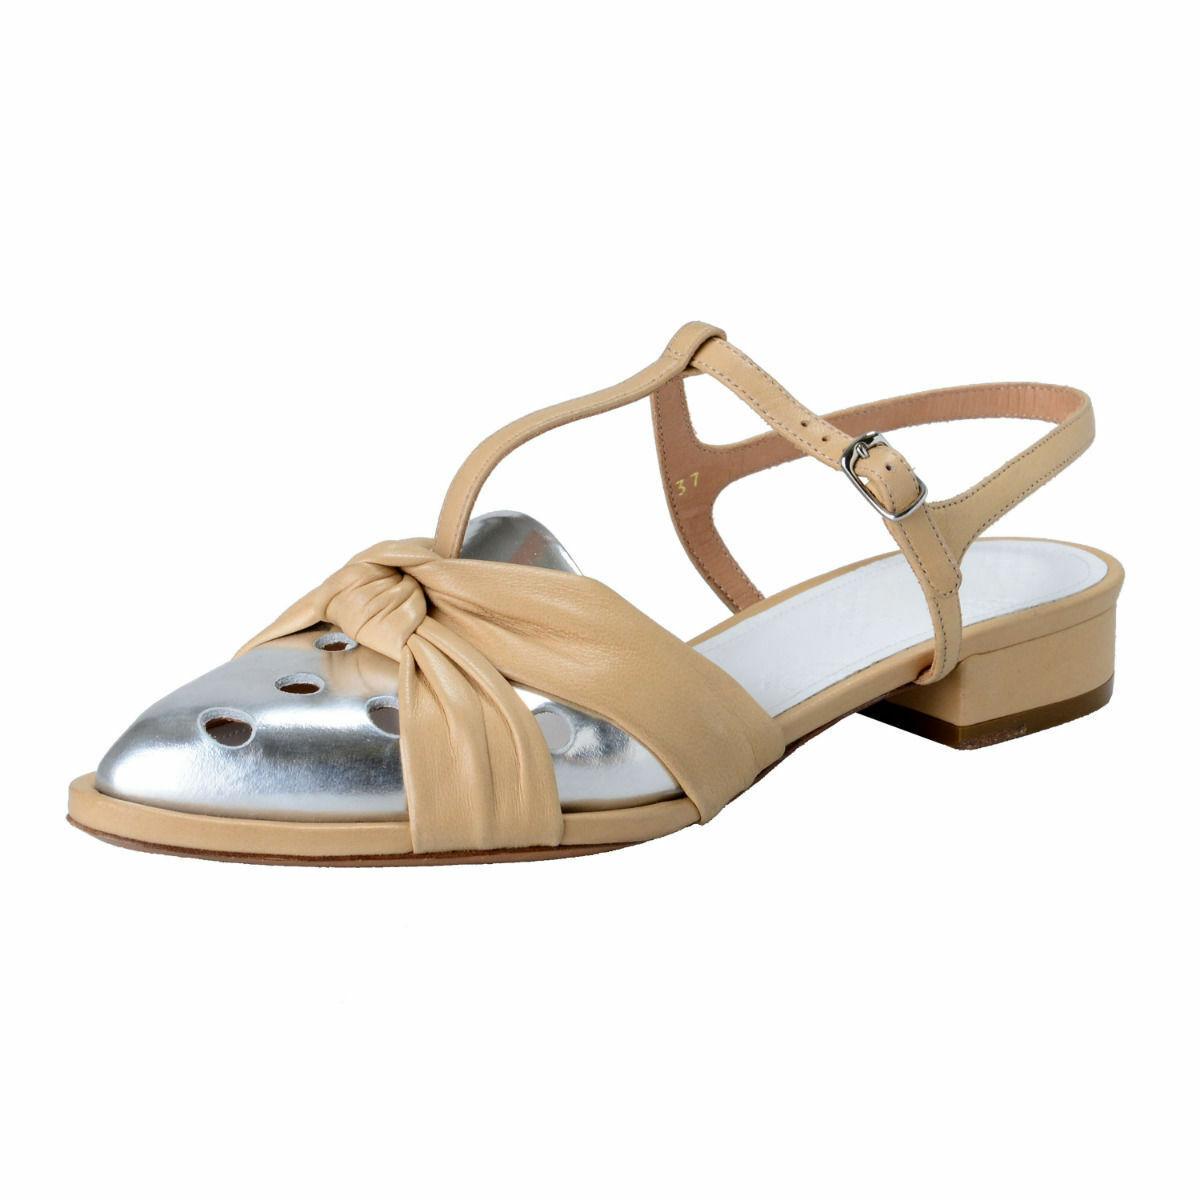 Maison Margiela 22 S Mujer Cuero Zapatos Sandalias Zapatos